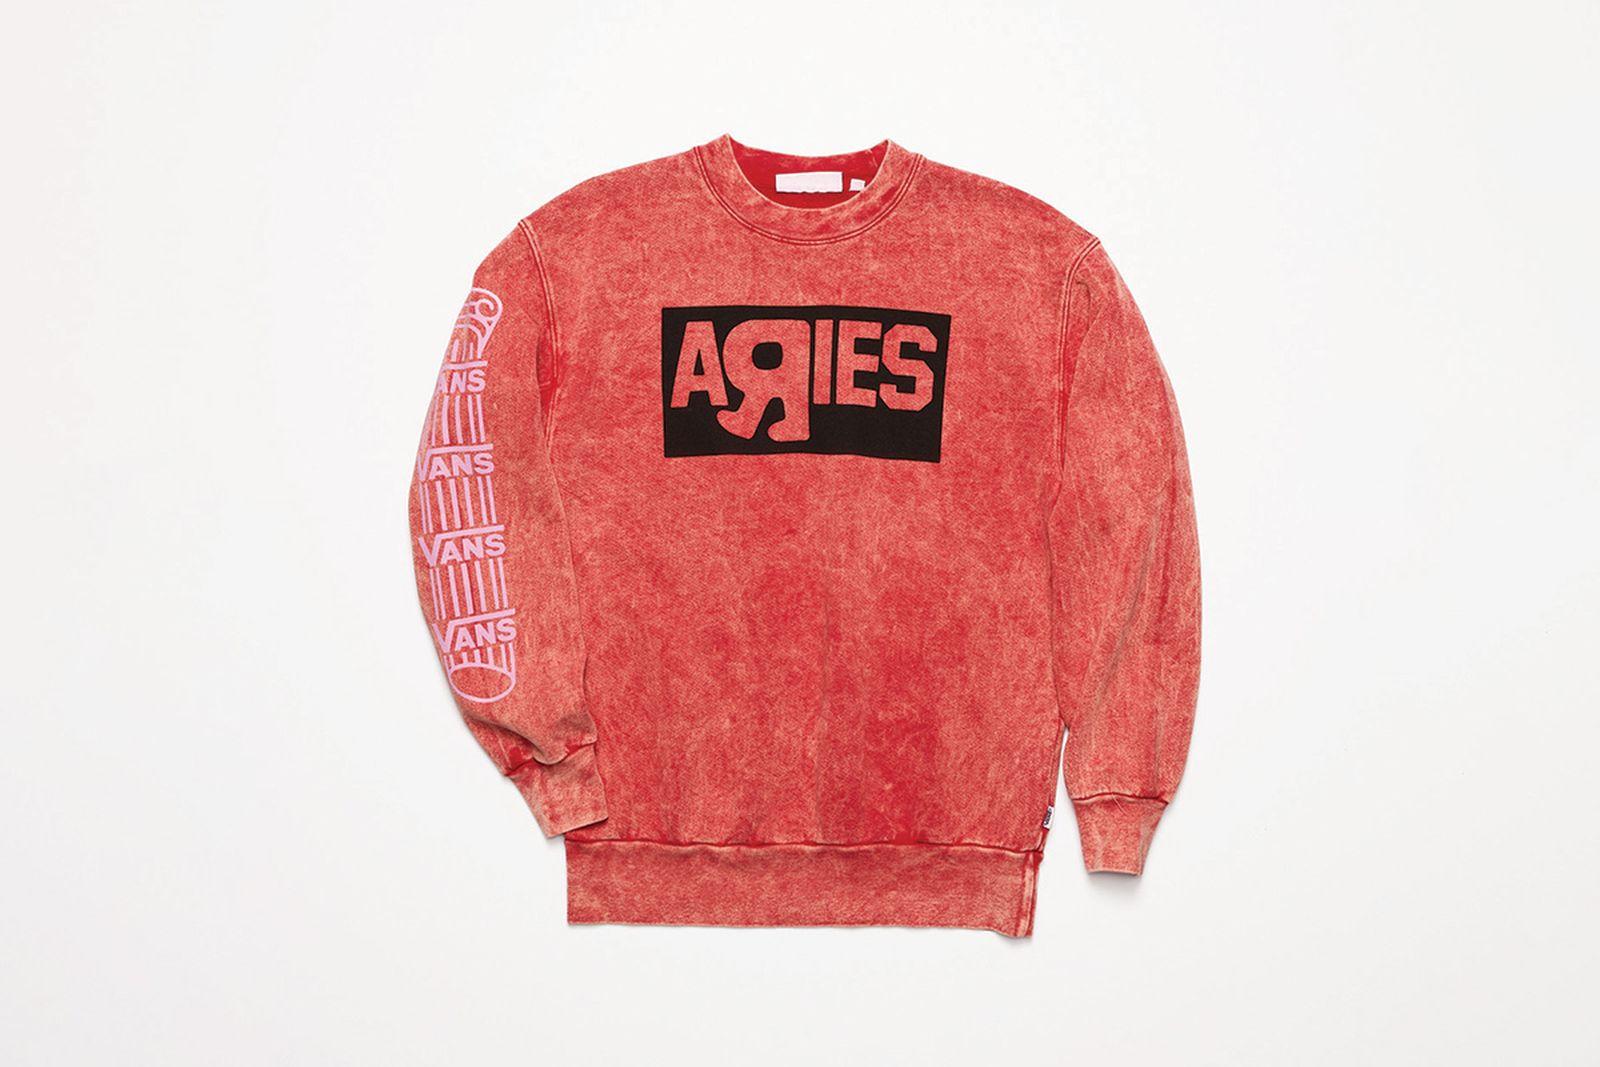 aries-vault-by-vans-go-your-own-way-release-date-price-04